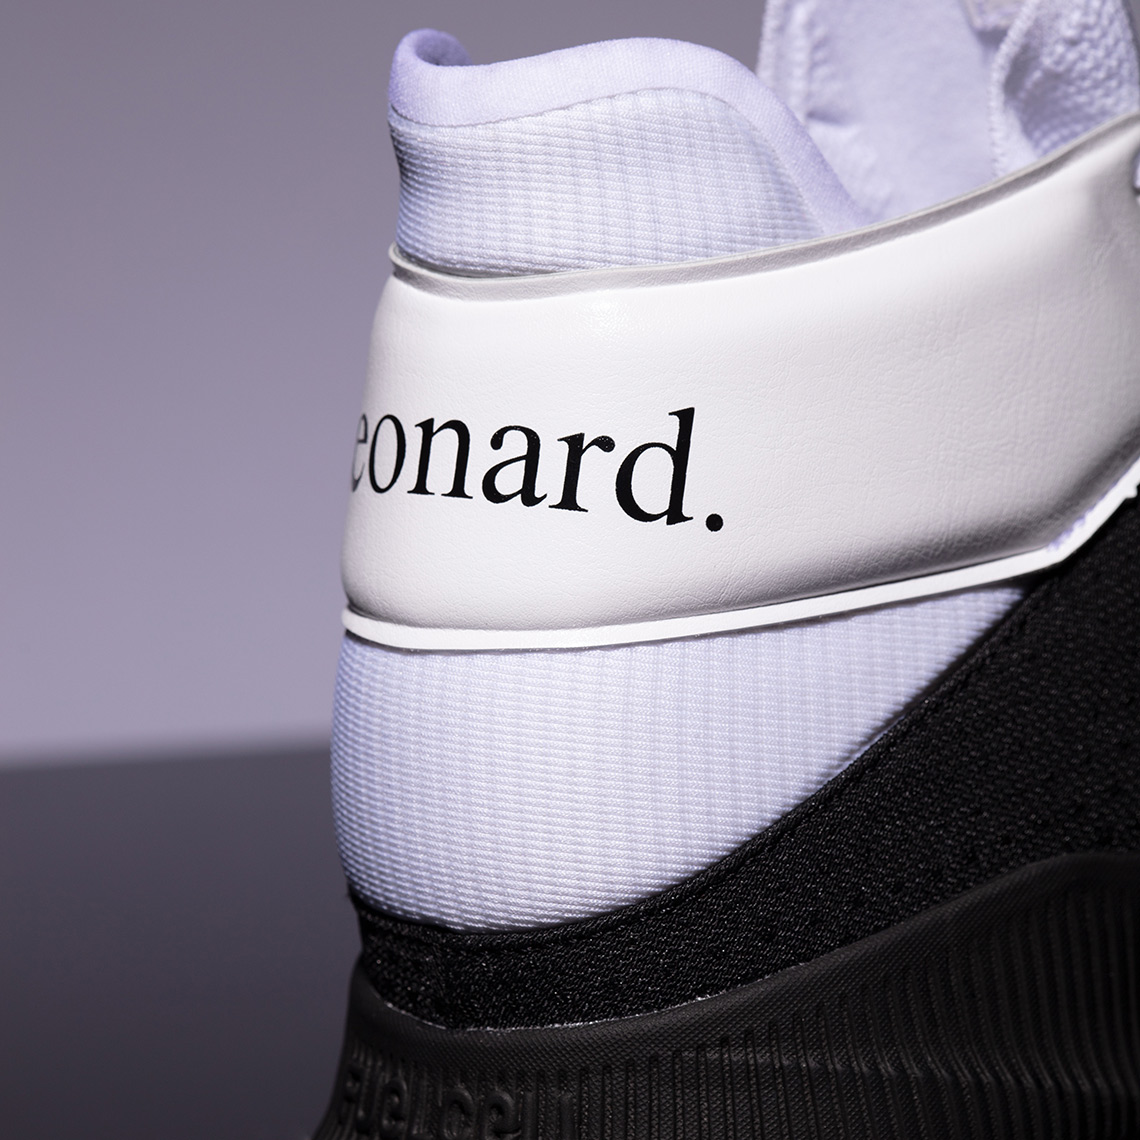 en soldes 14243 f3923 Kawhi Leonard New Balance Shoes - First Look + Release Info ...